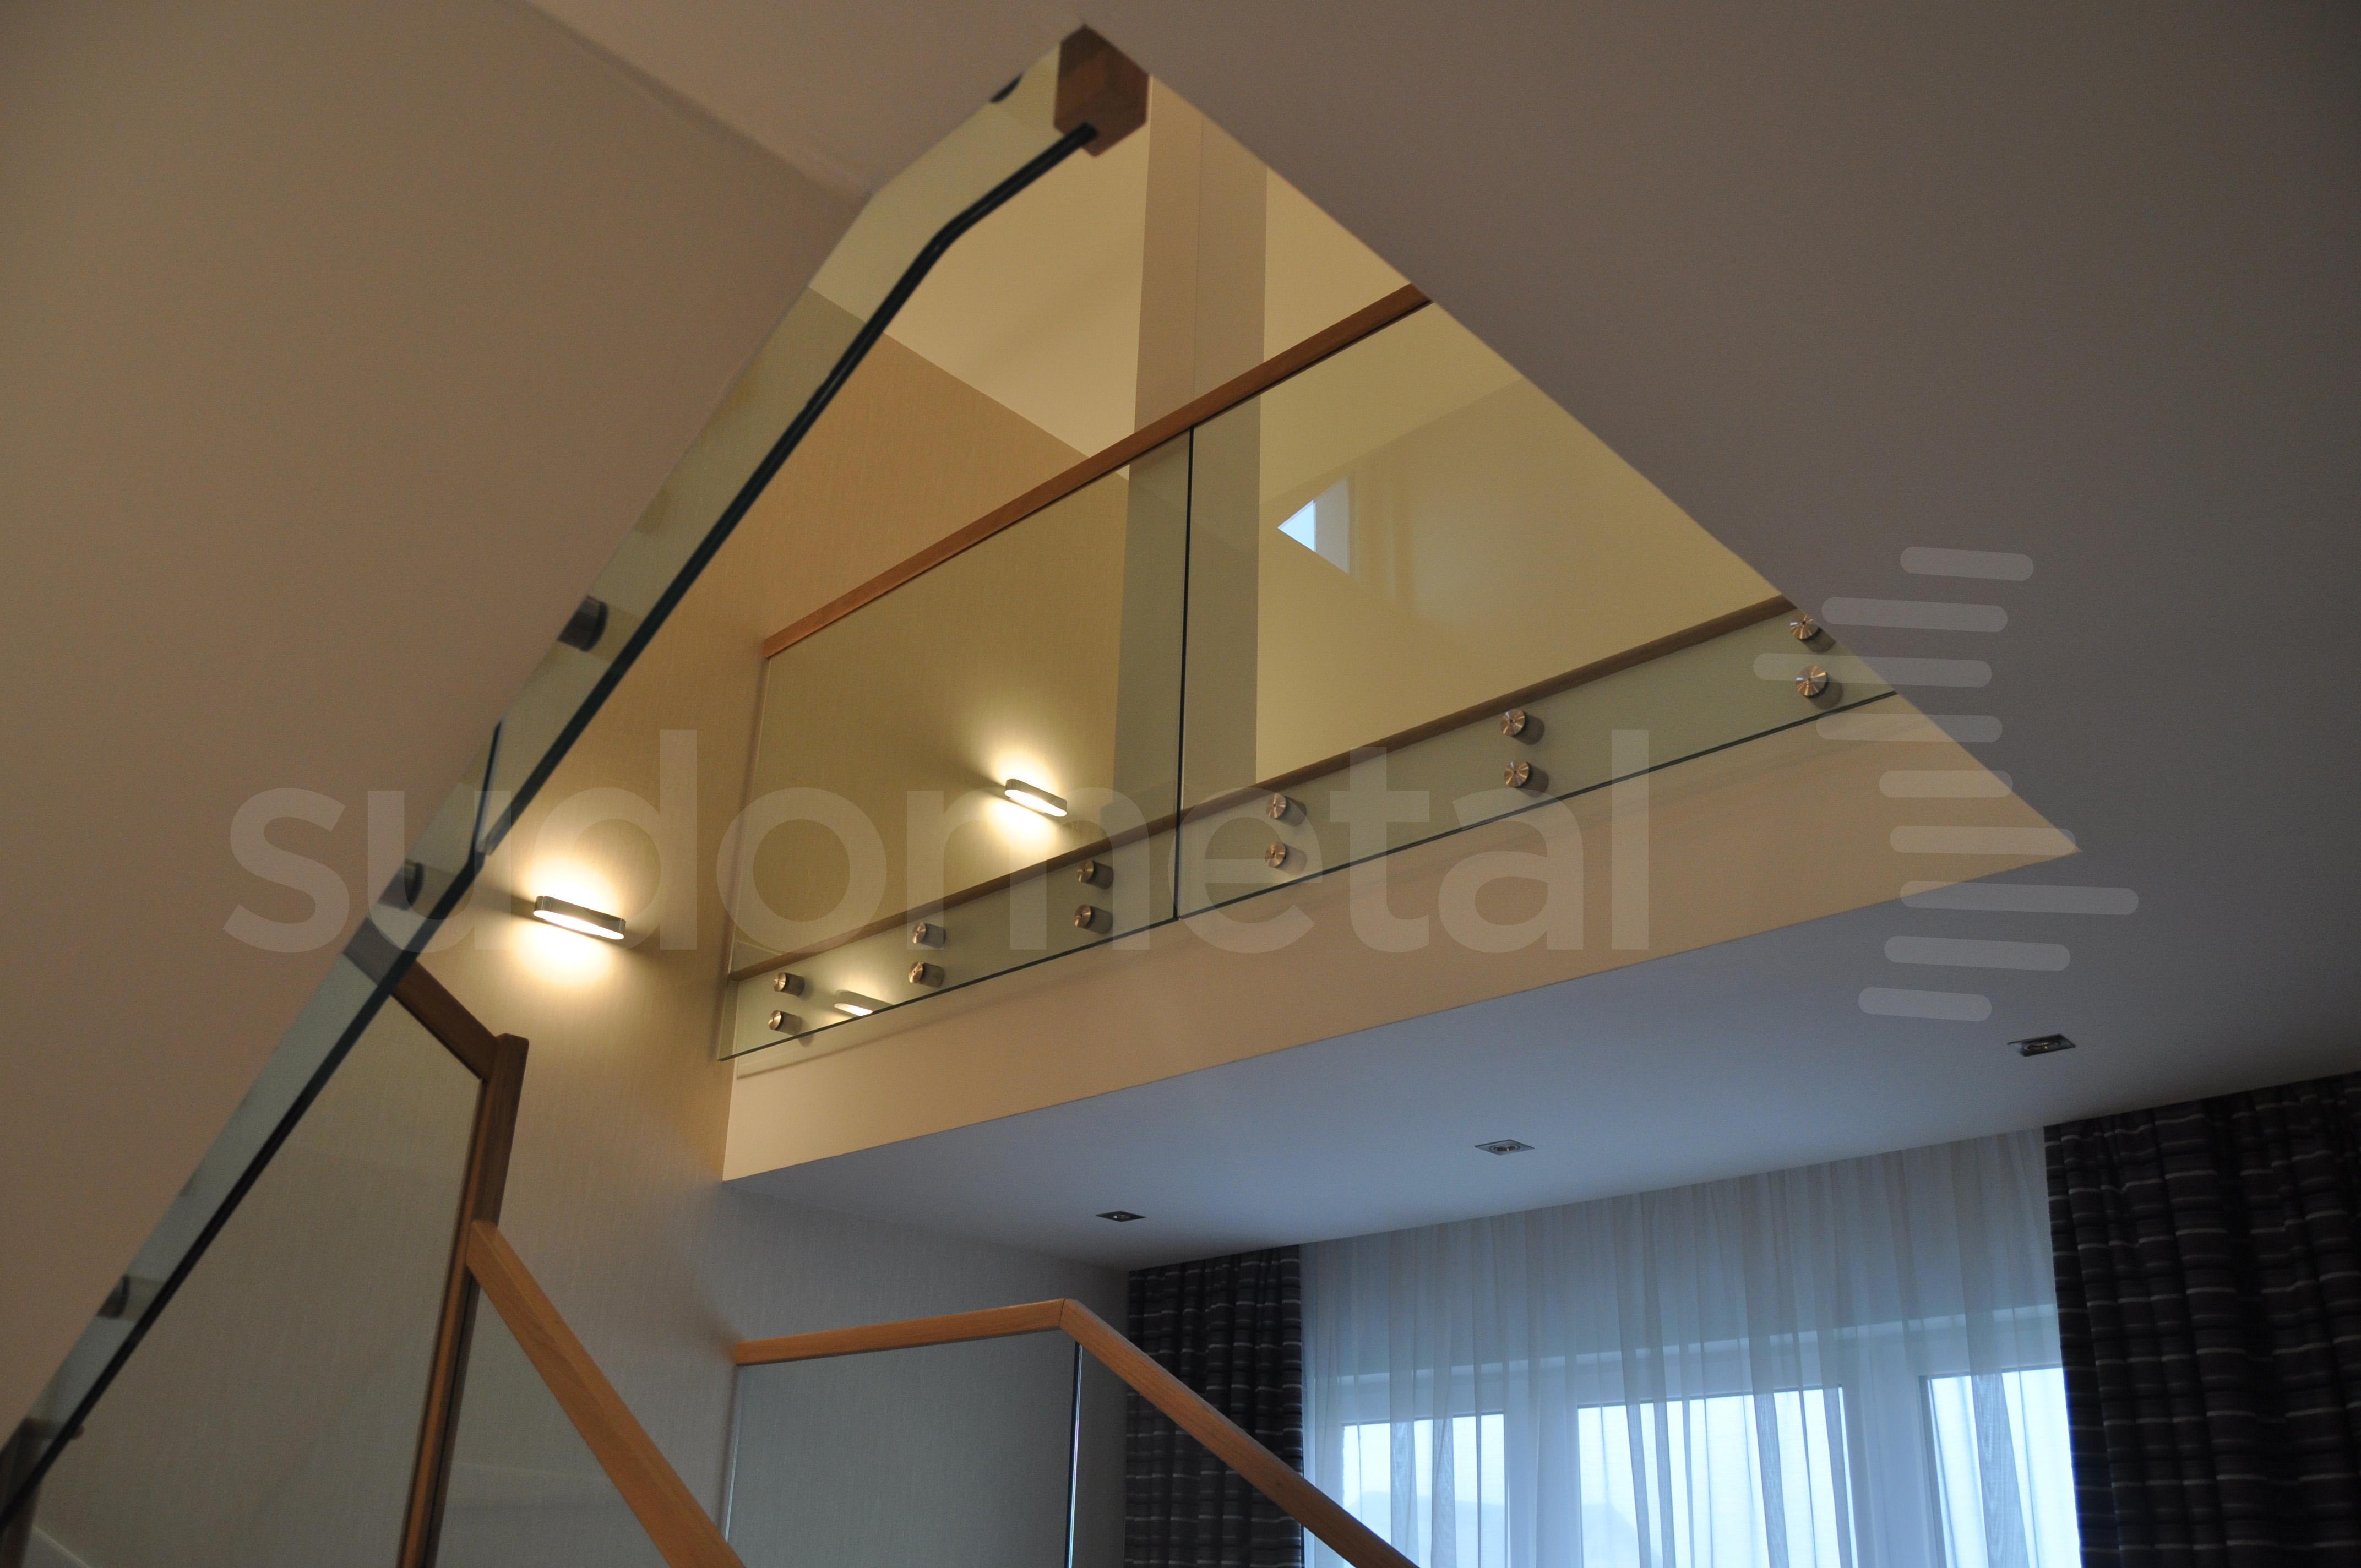 Balustrade din sticla - Balustrada casa particulara Otopeni SUDOMETAL - Poza 1